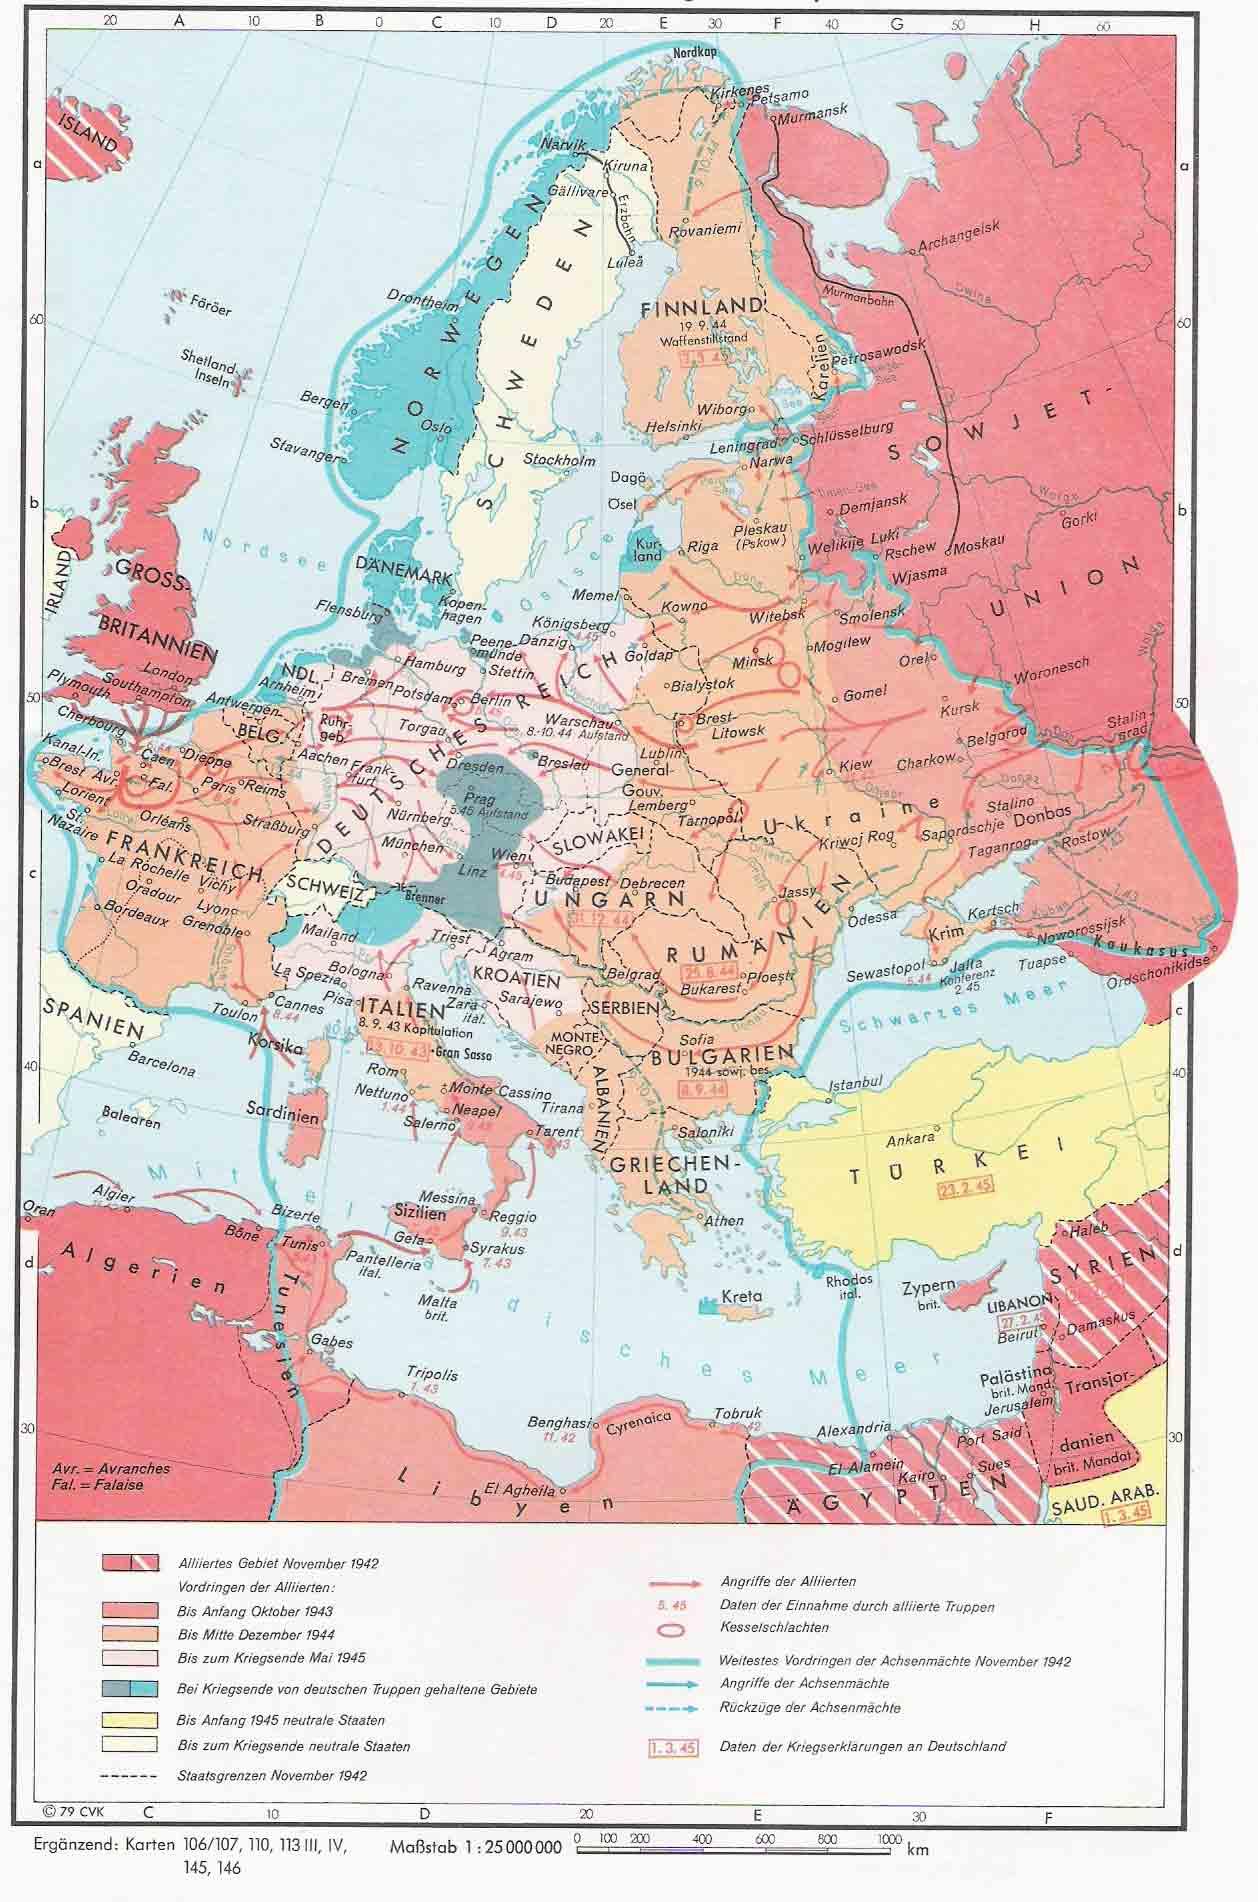 World war ii in europe 1942 1945